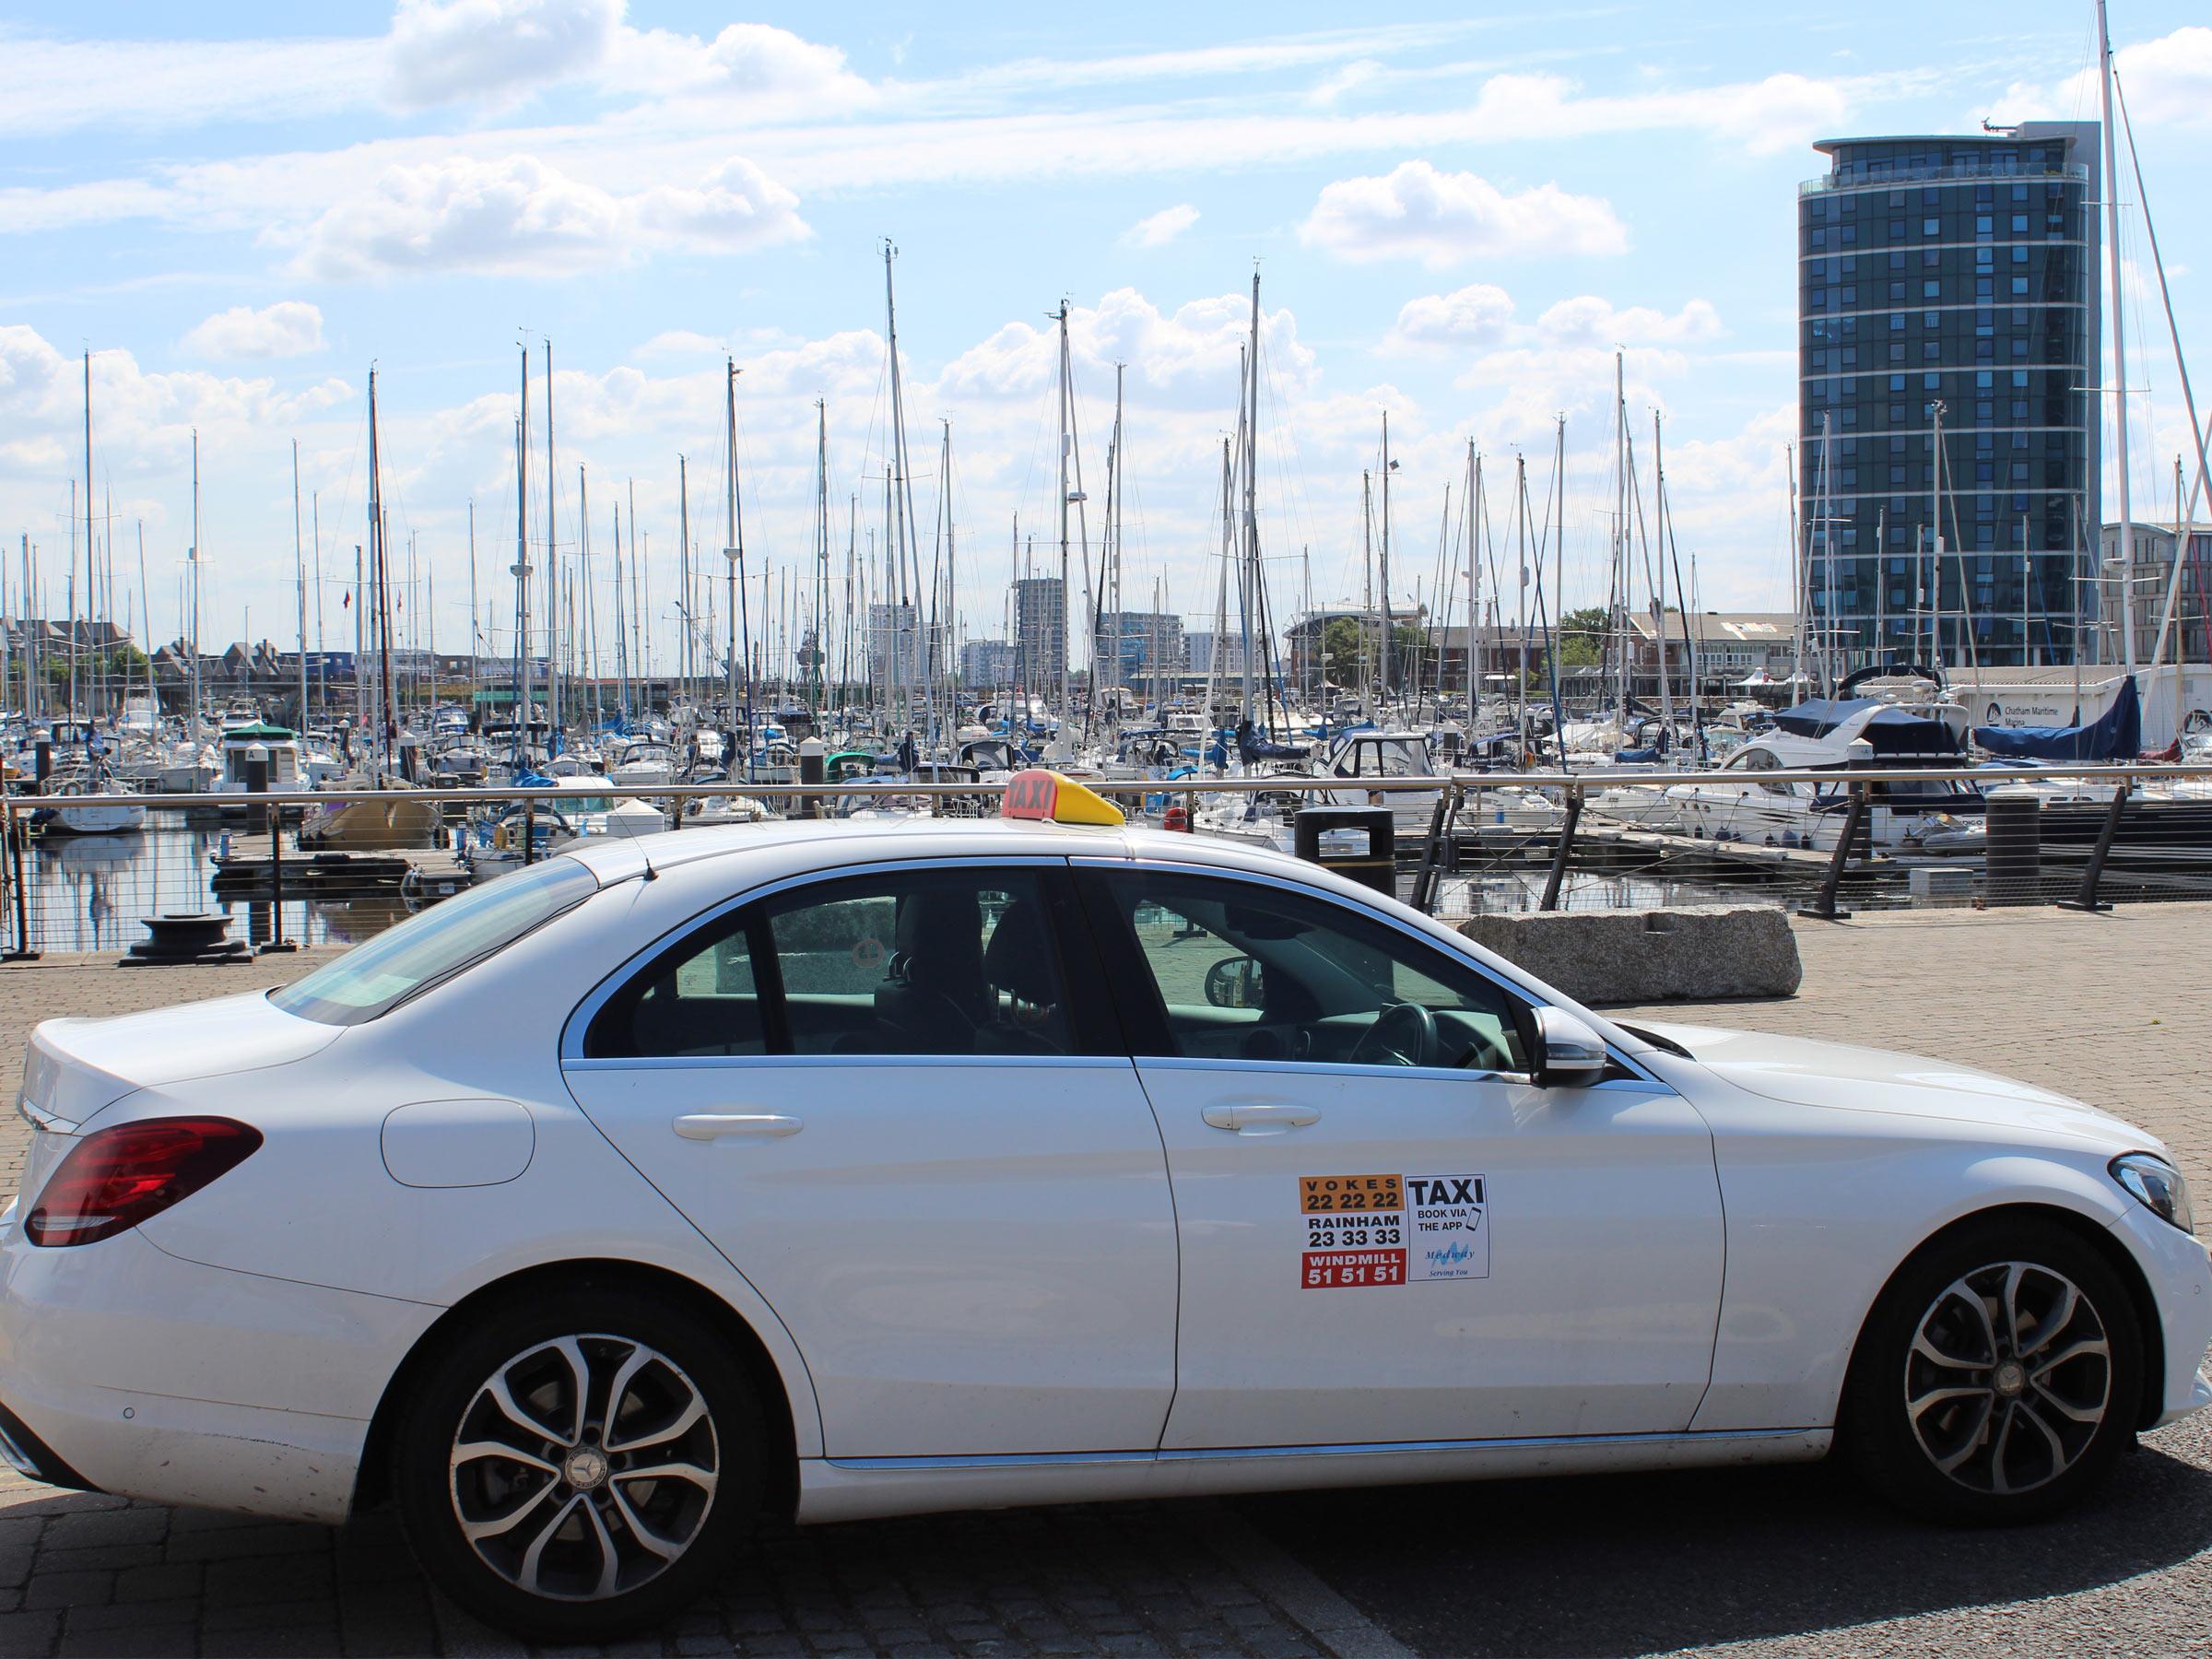 Vokes Taxi Chatham Marina